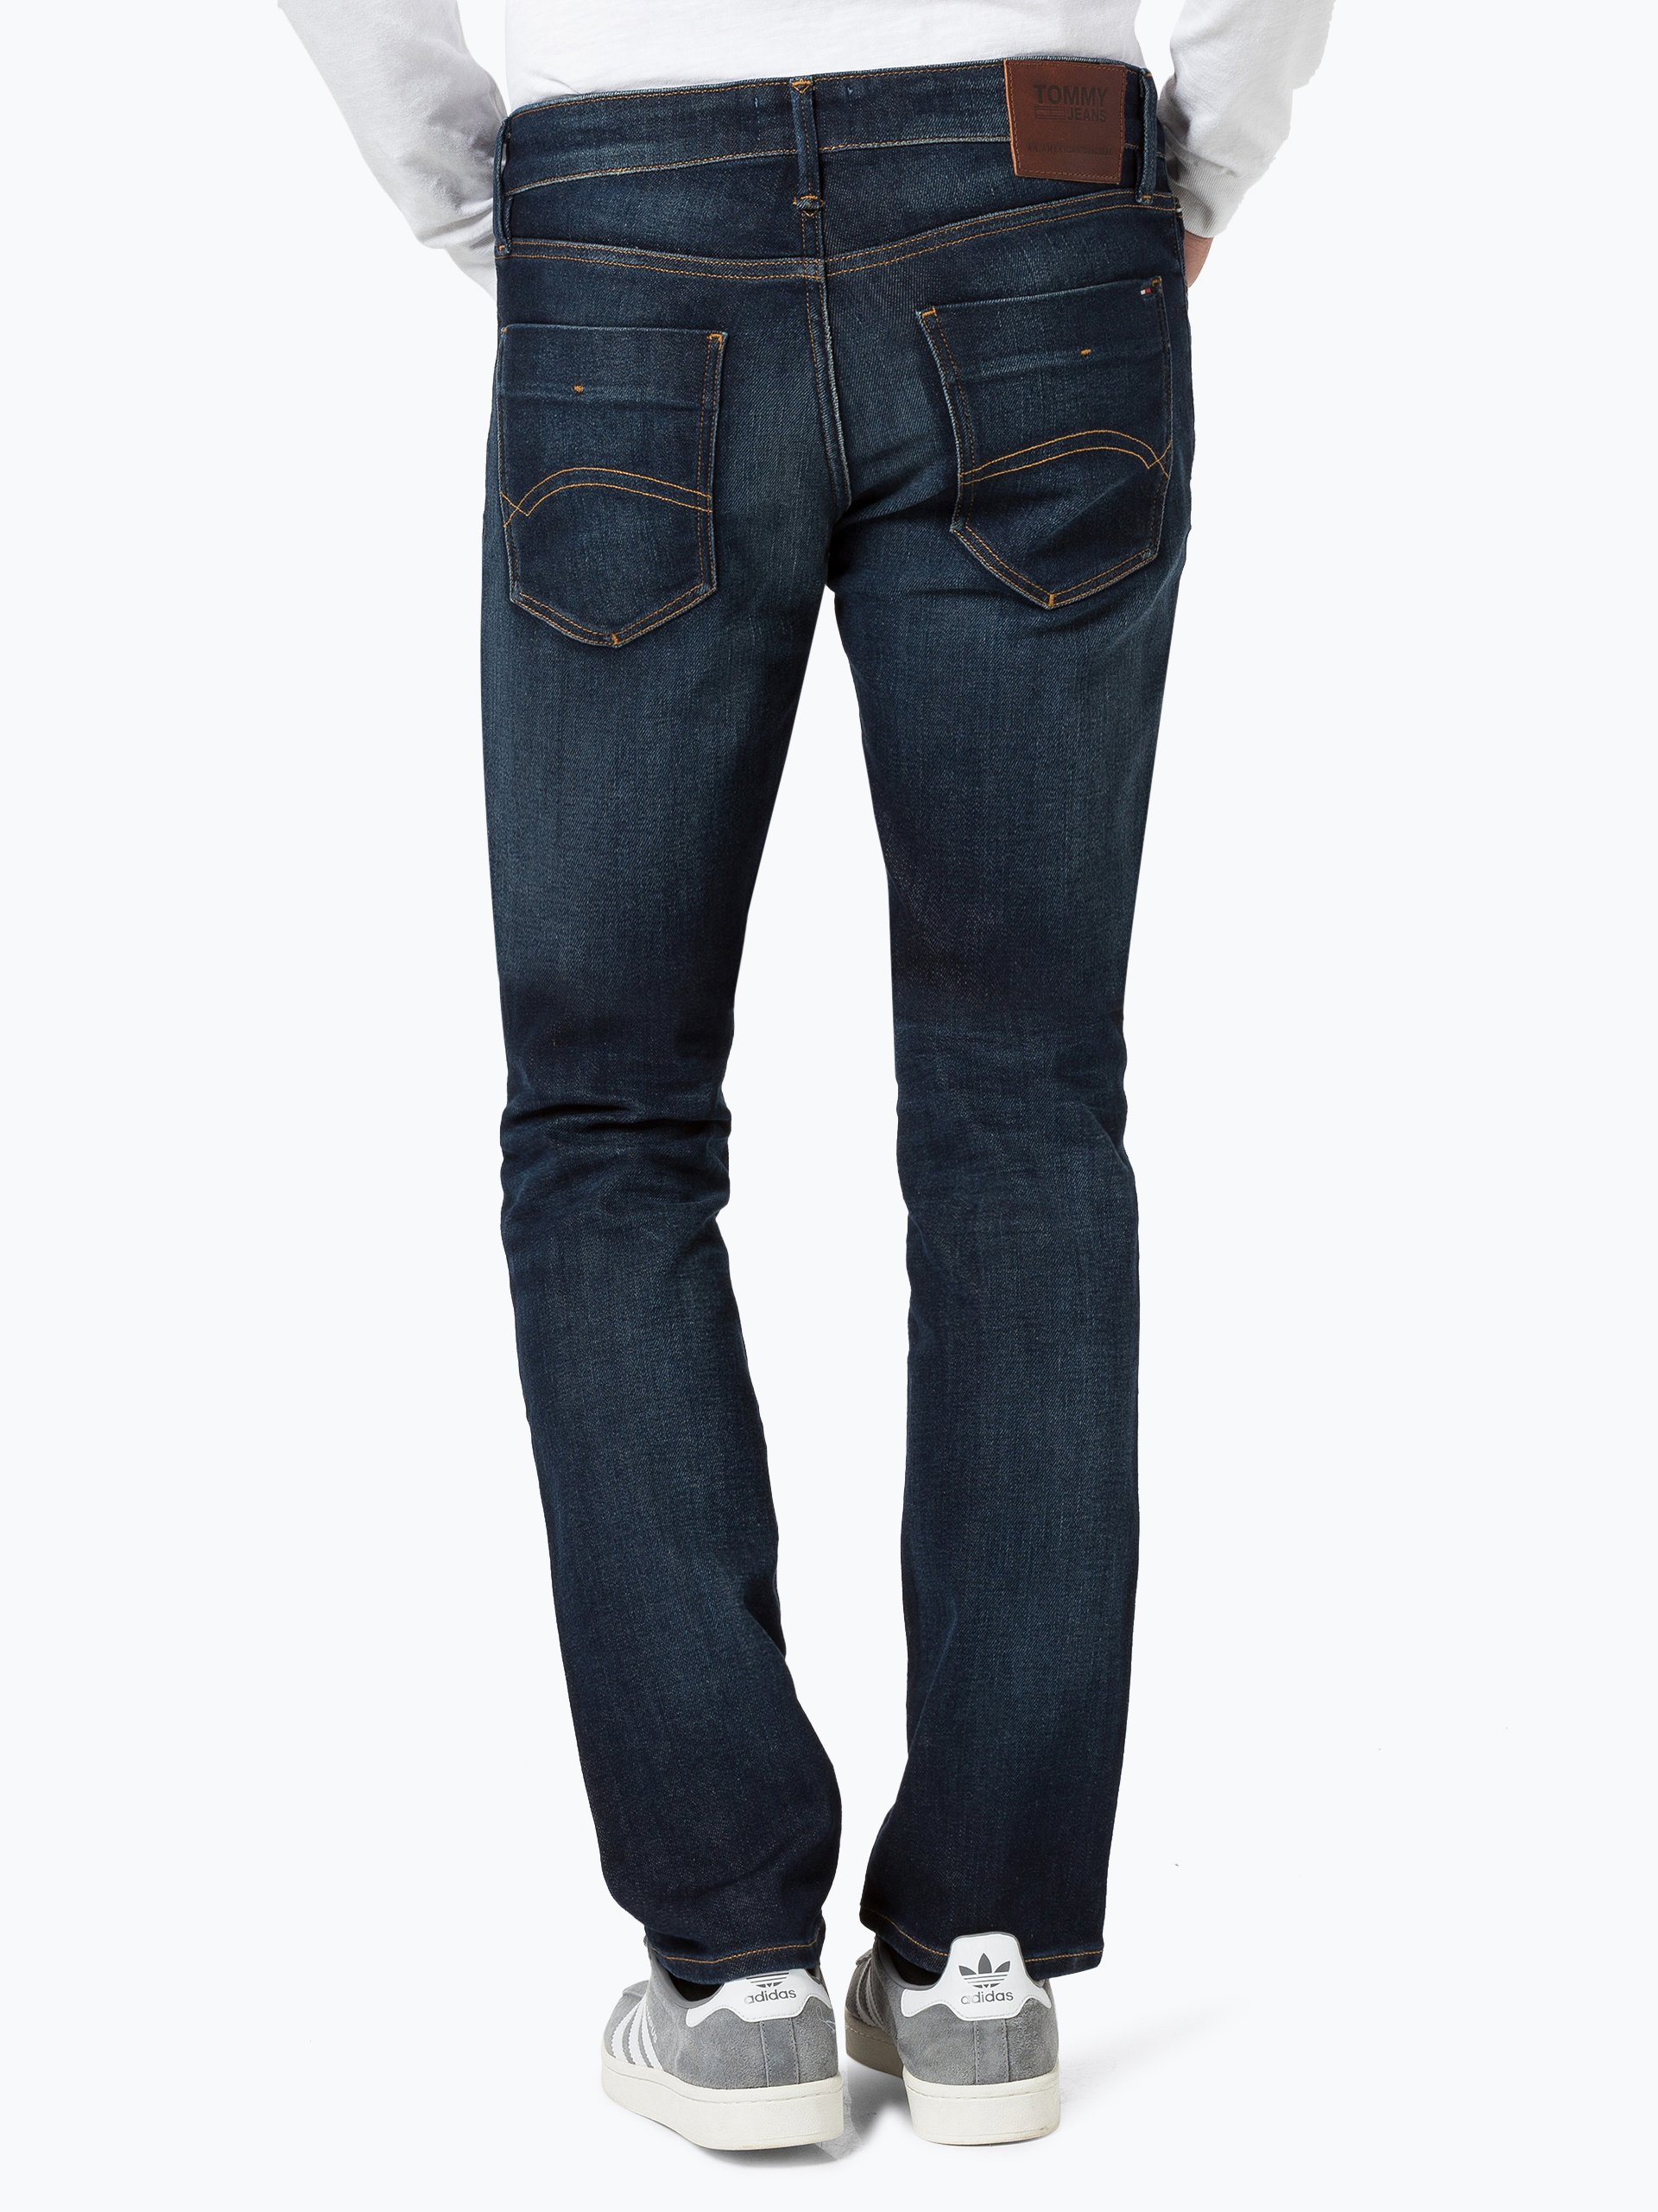 Tommy Jeans Herren Jeans - Scanton